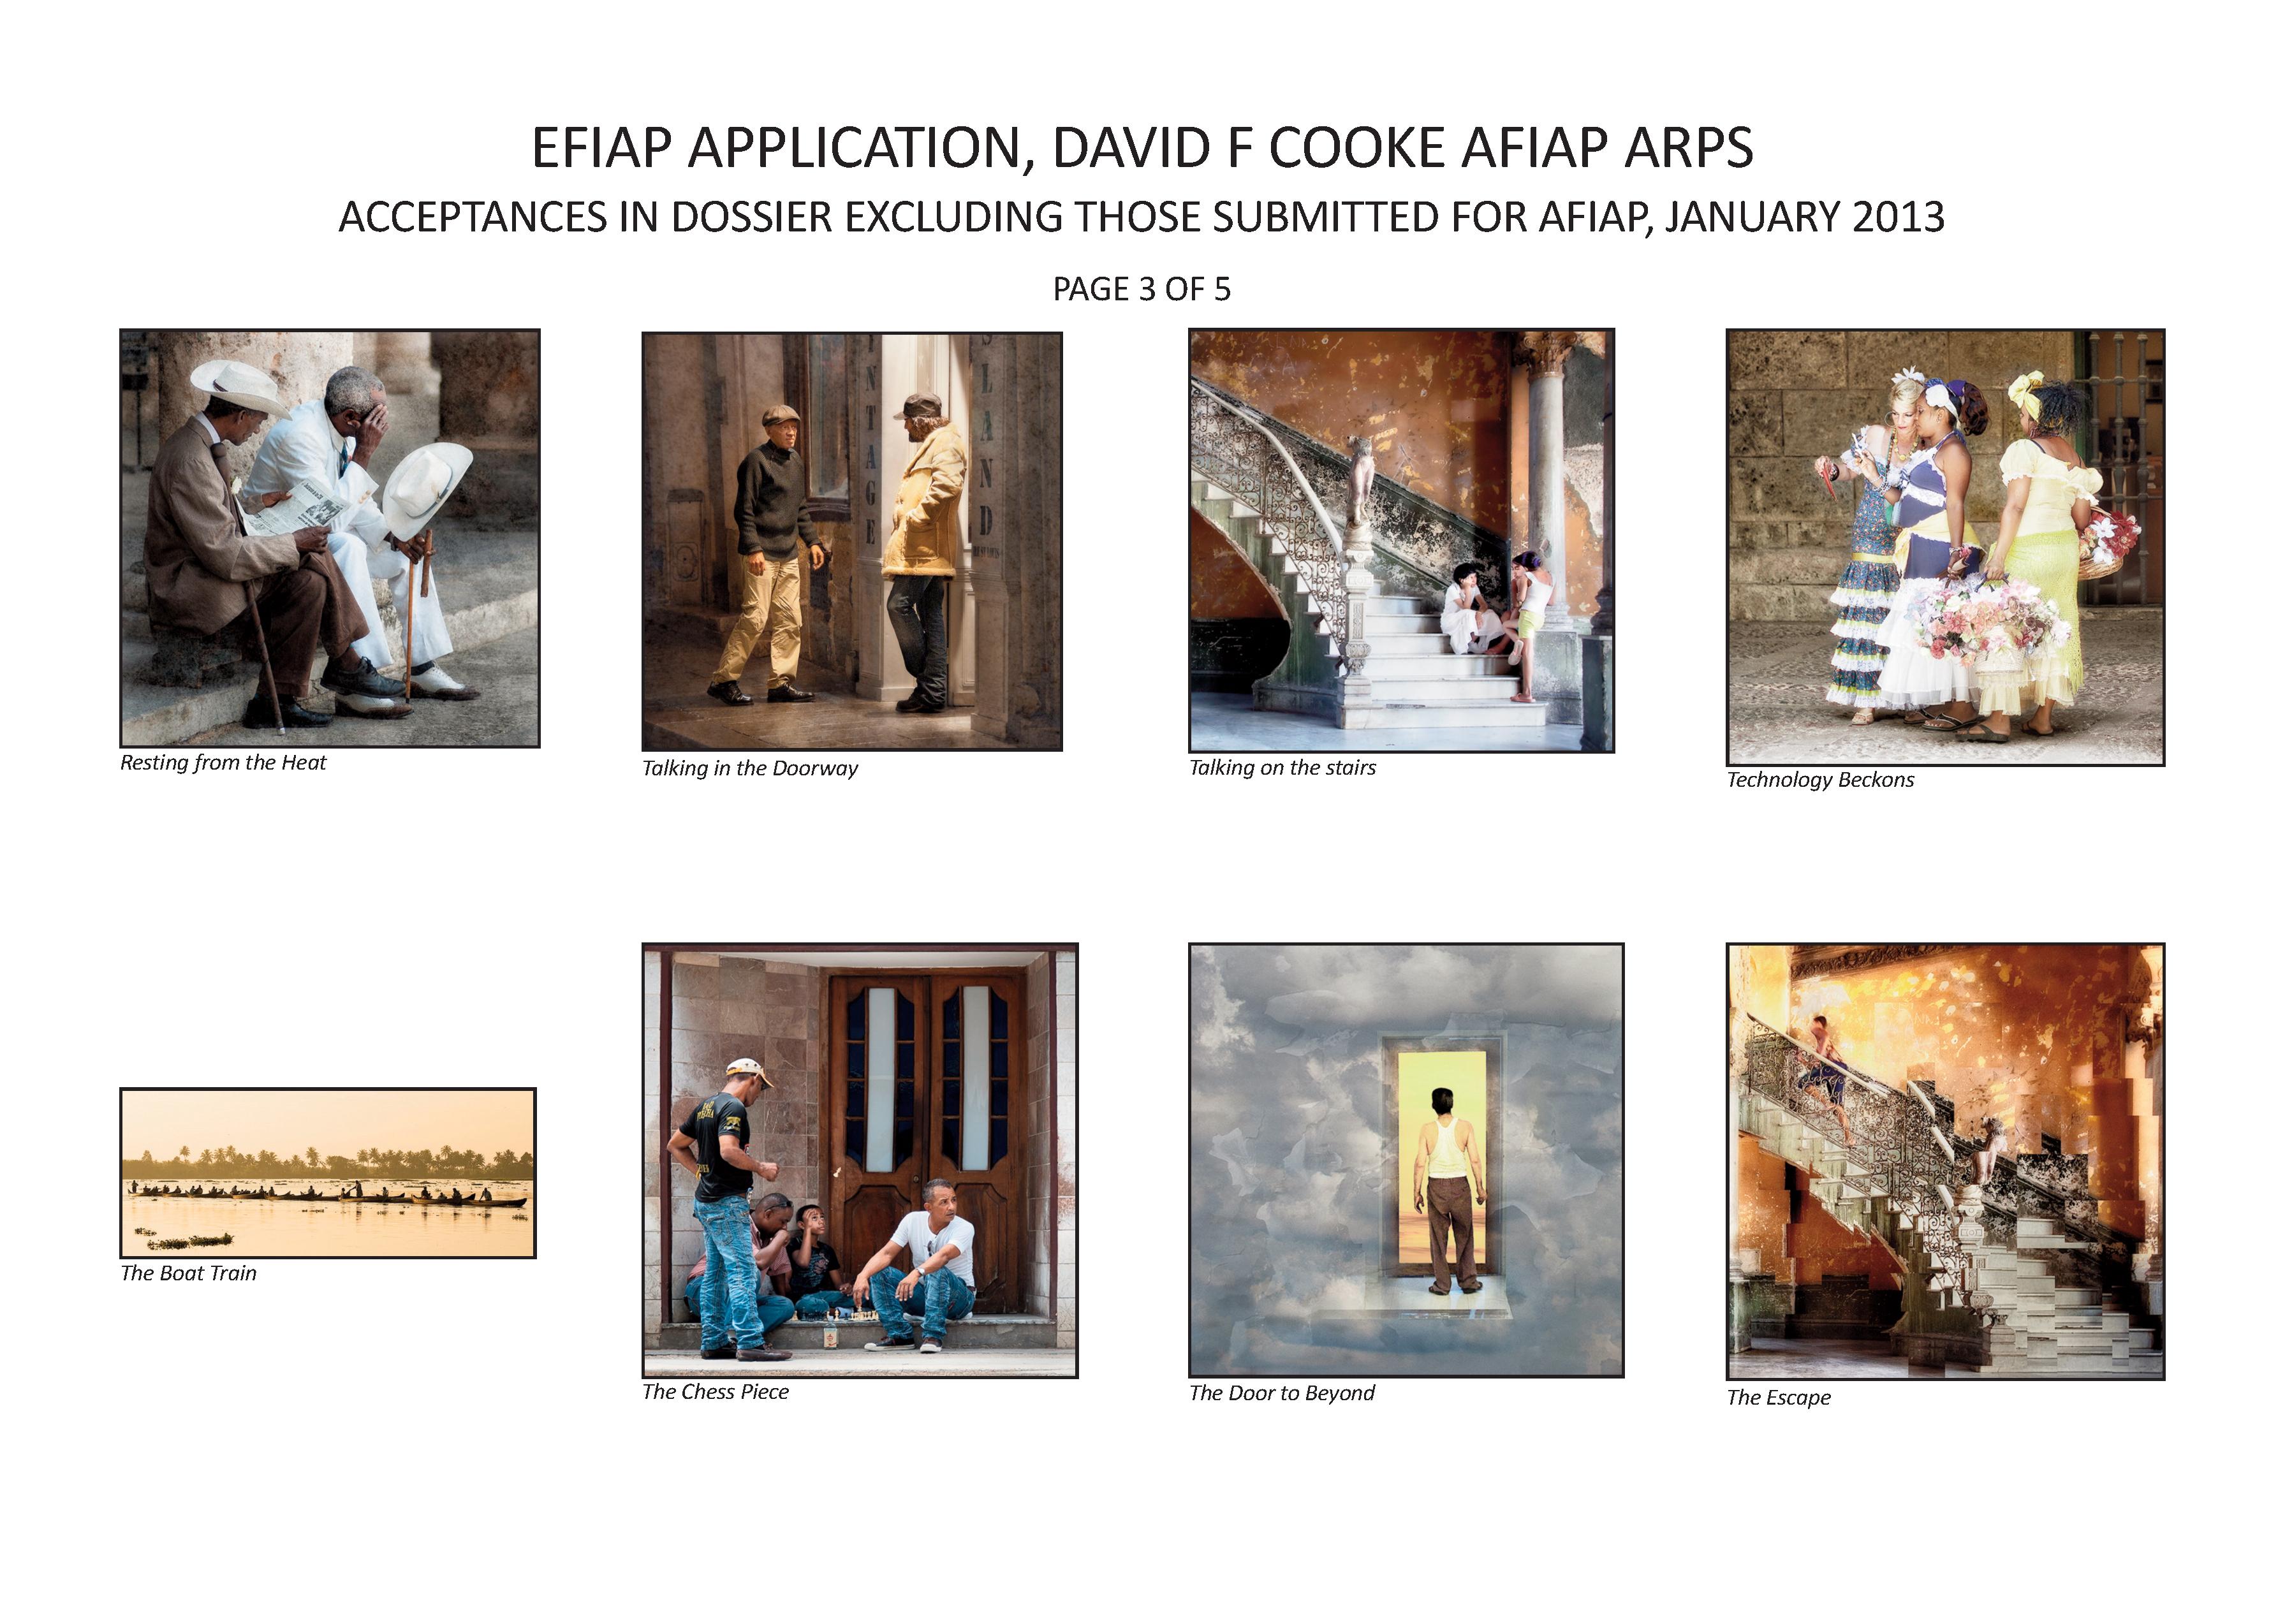 EFIAP-images-3